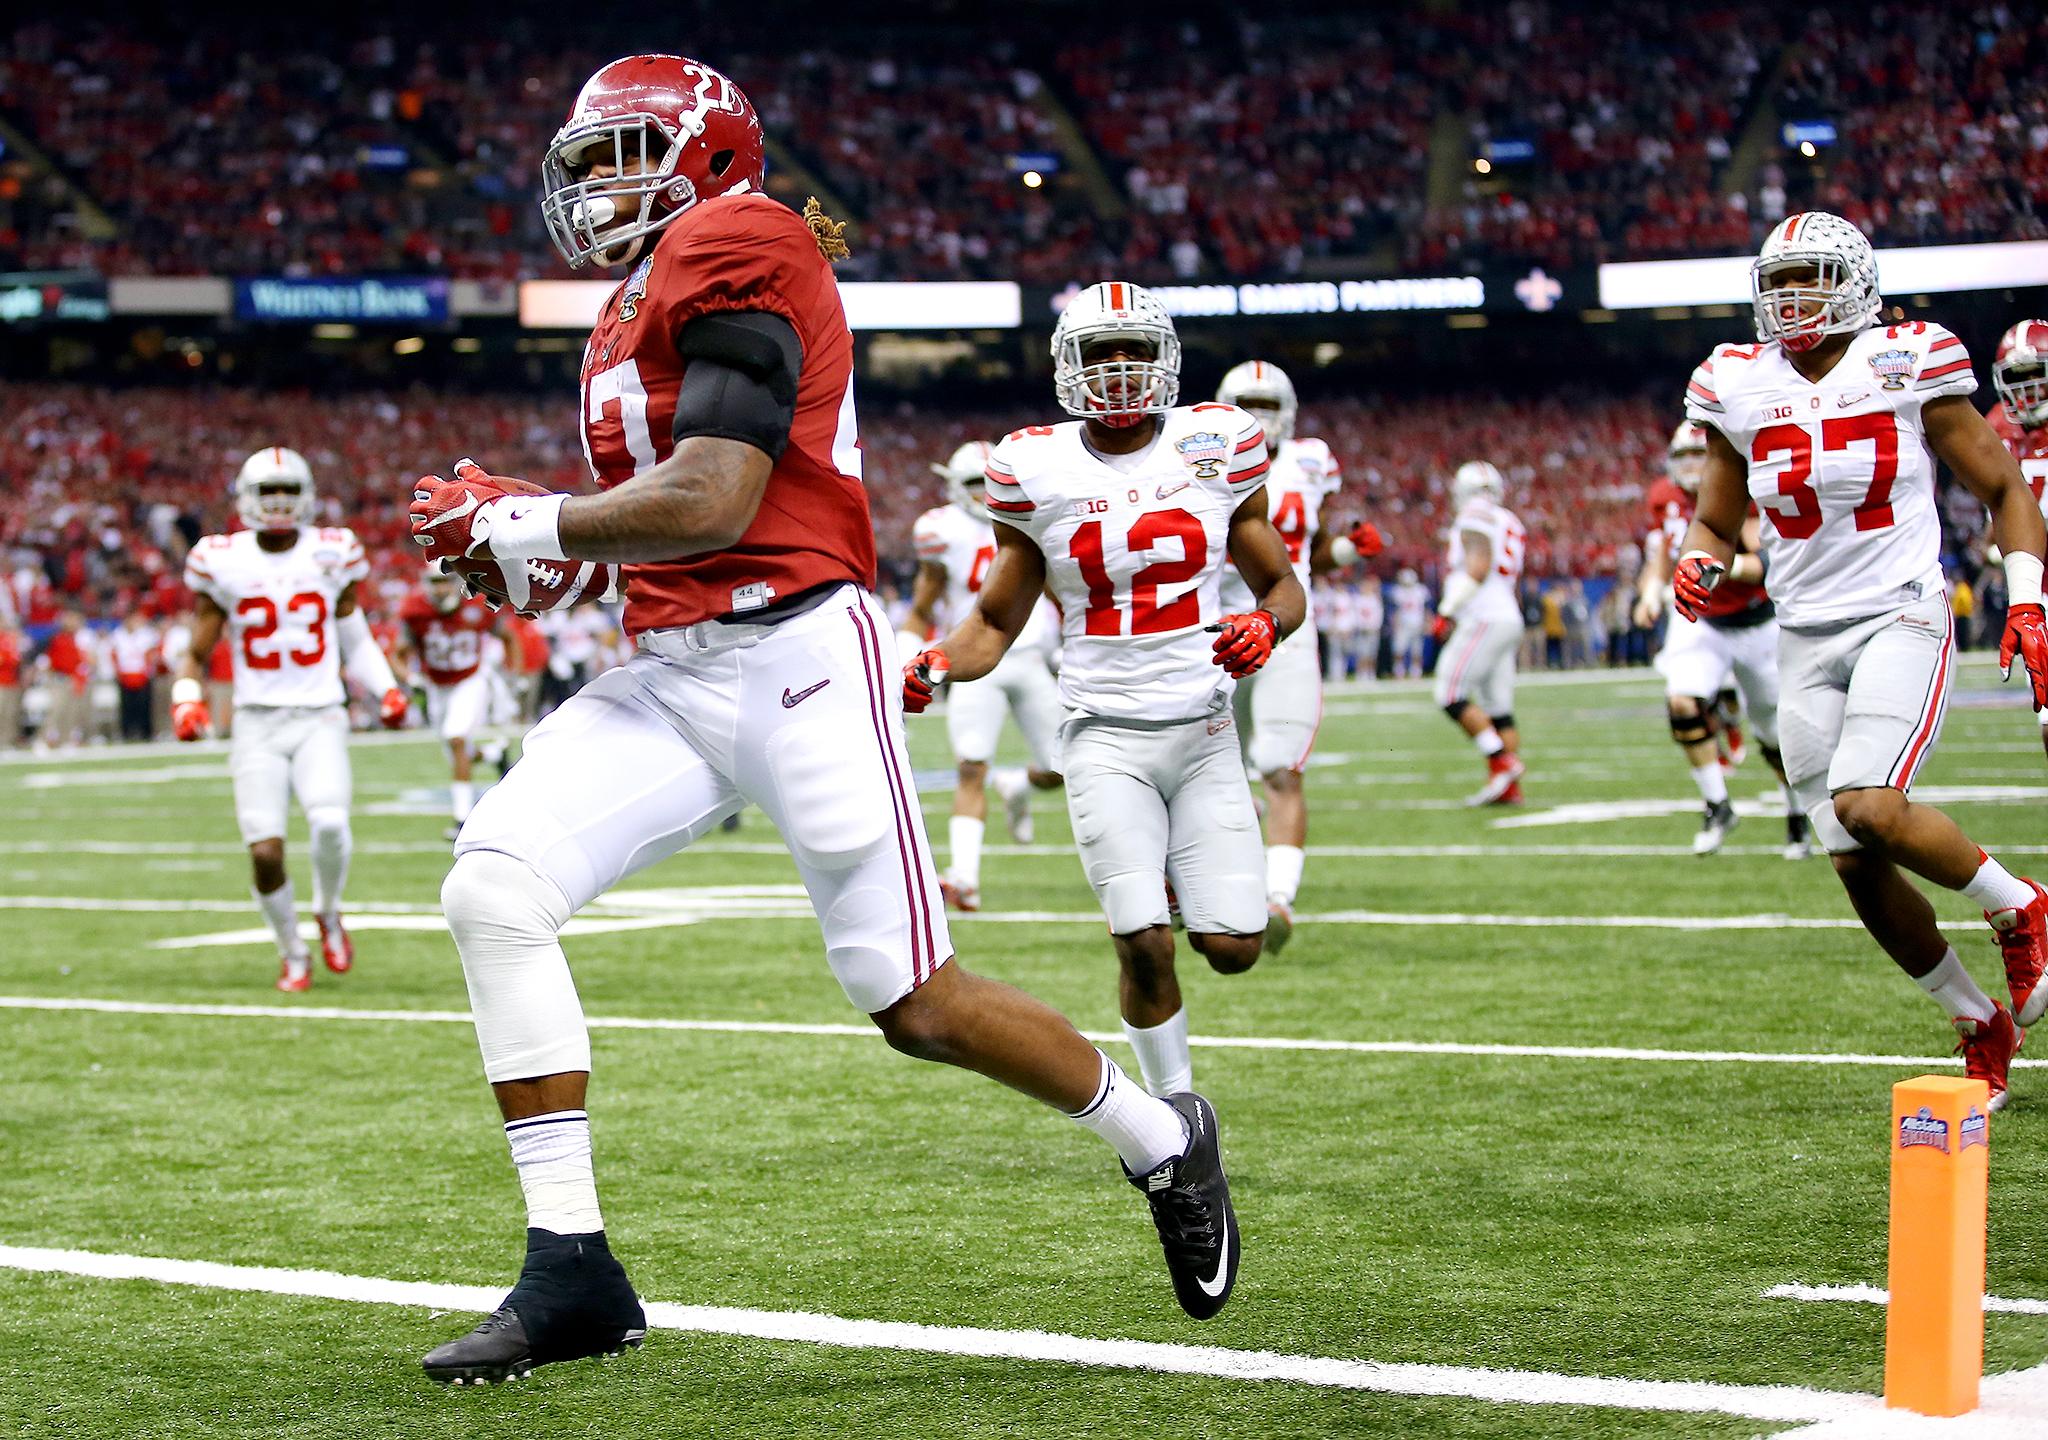 50+ Ohio State Vs Alabama 2015 Score Pictures